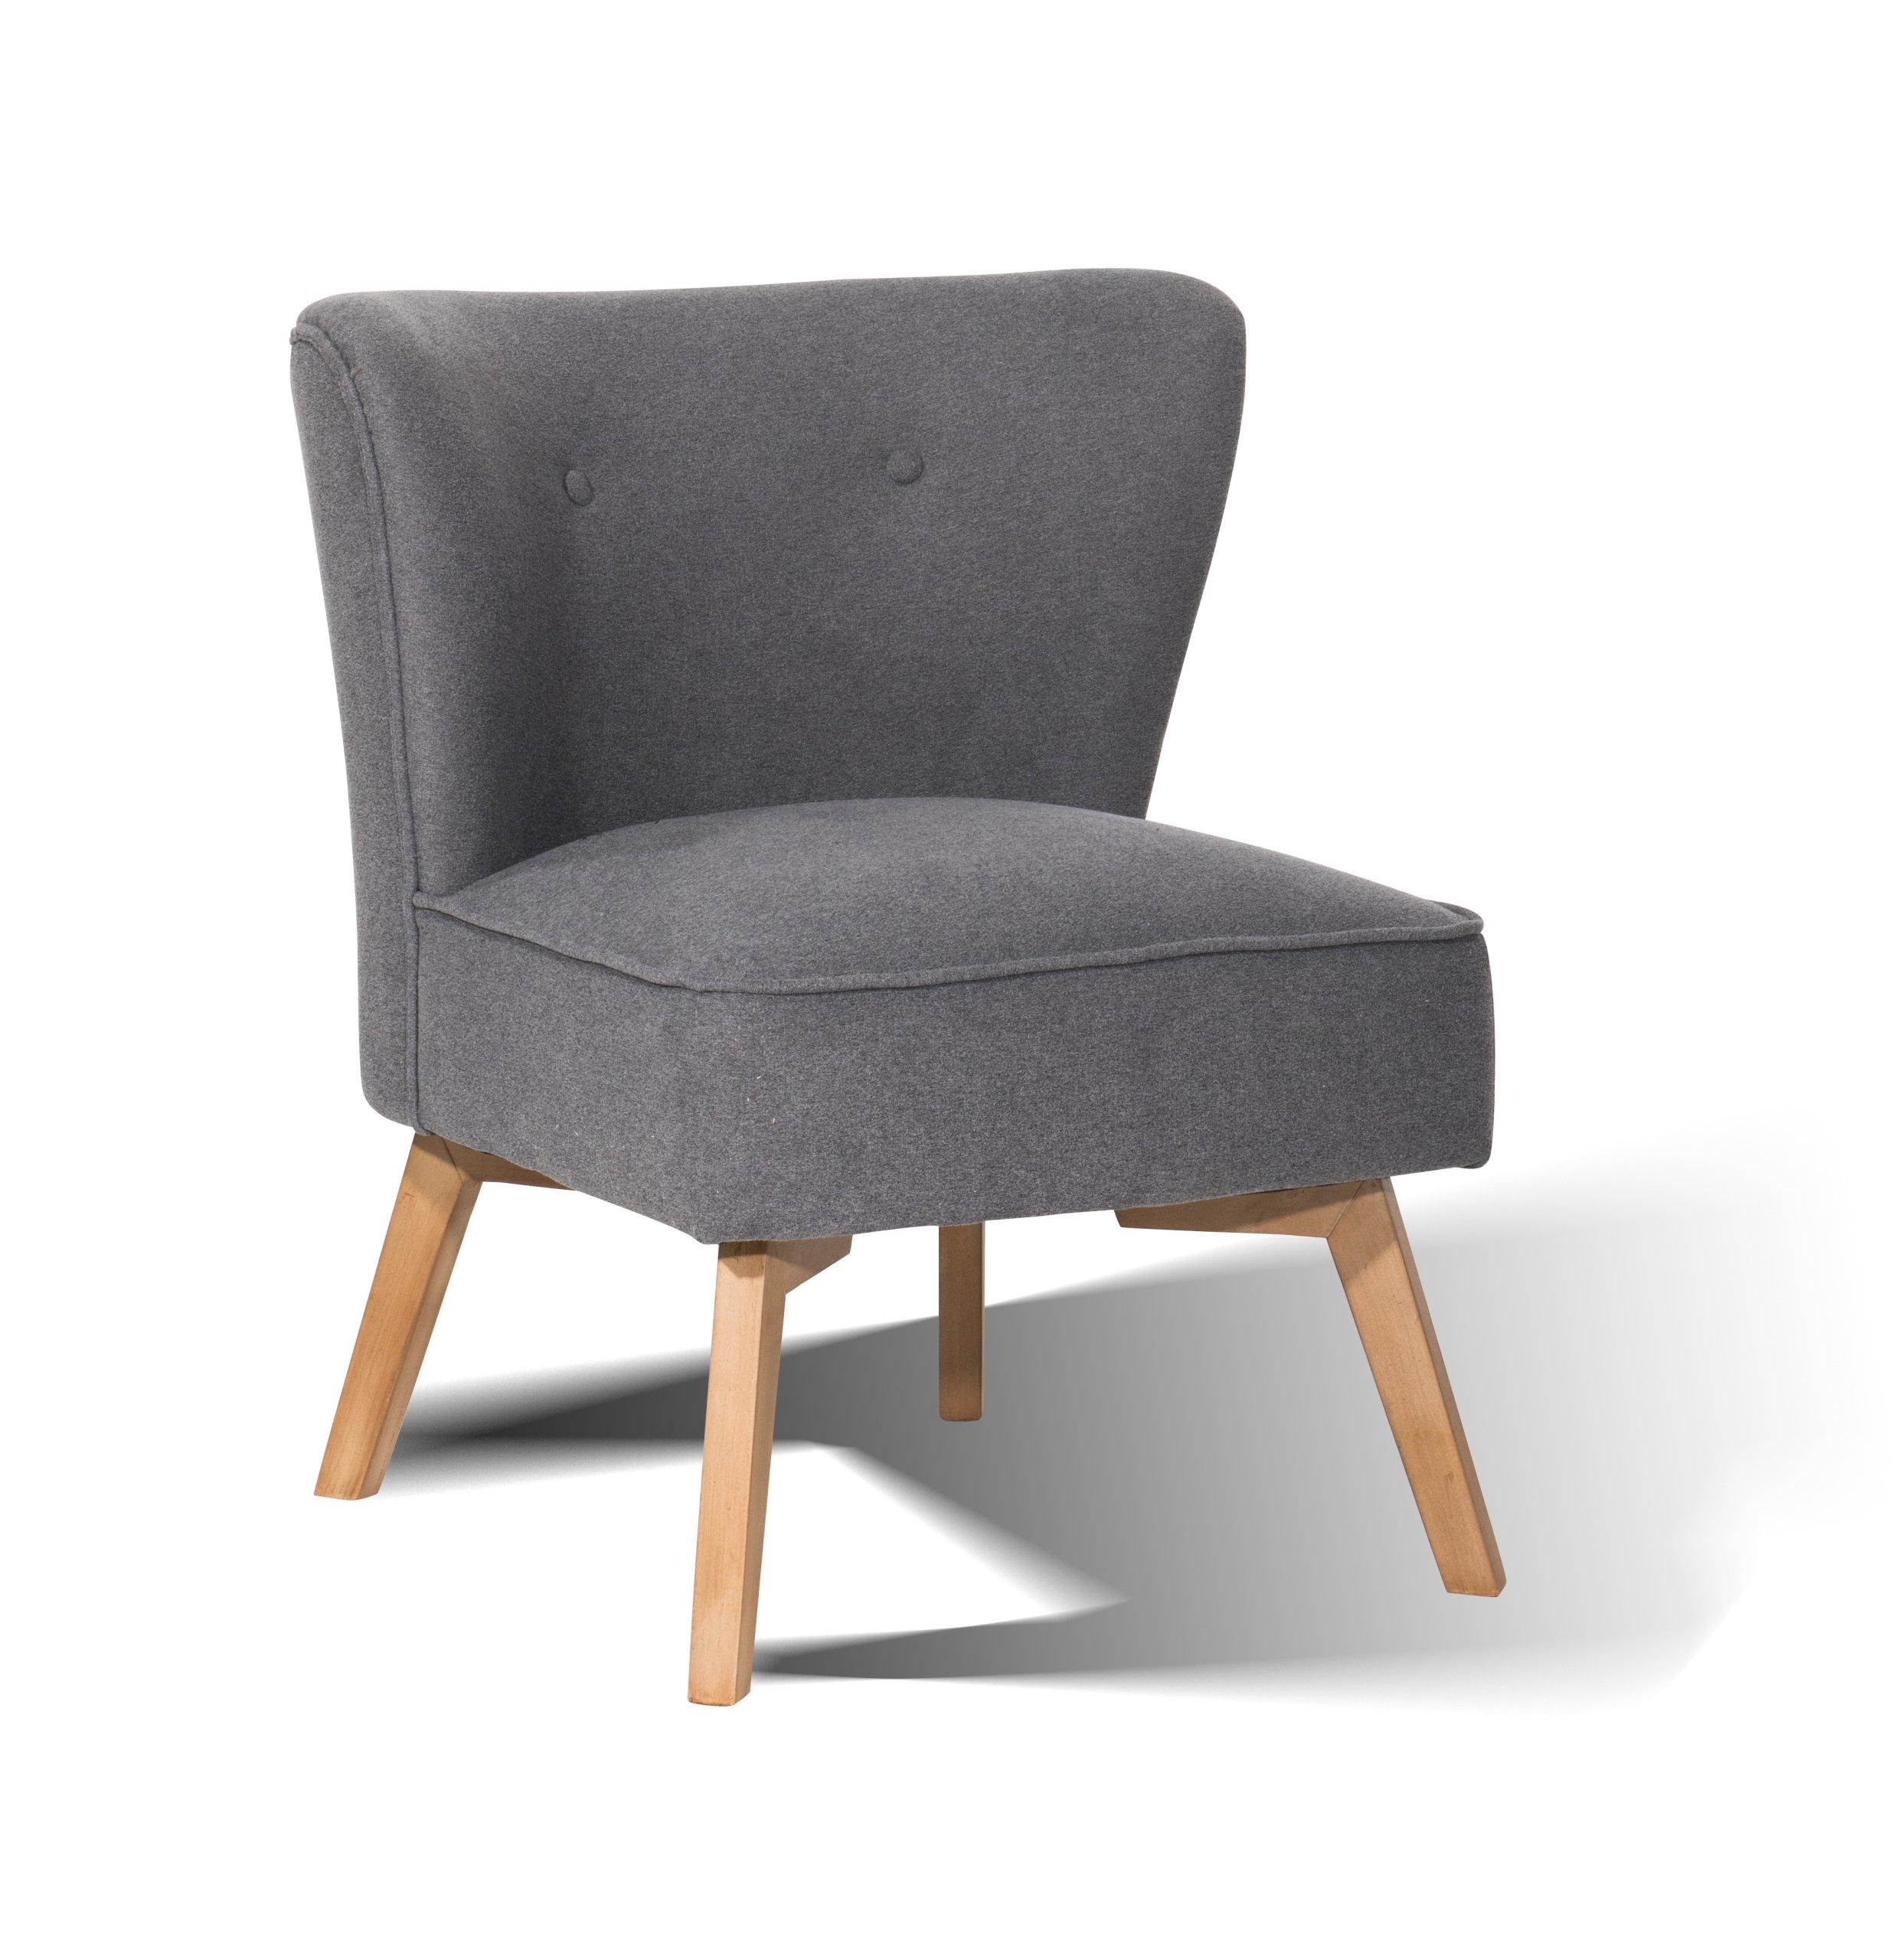 Stolička čalúnená Vintage sivá strom lite